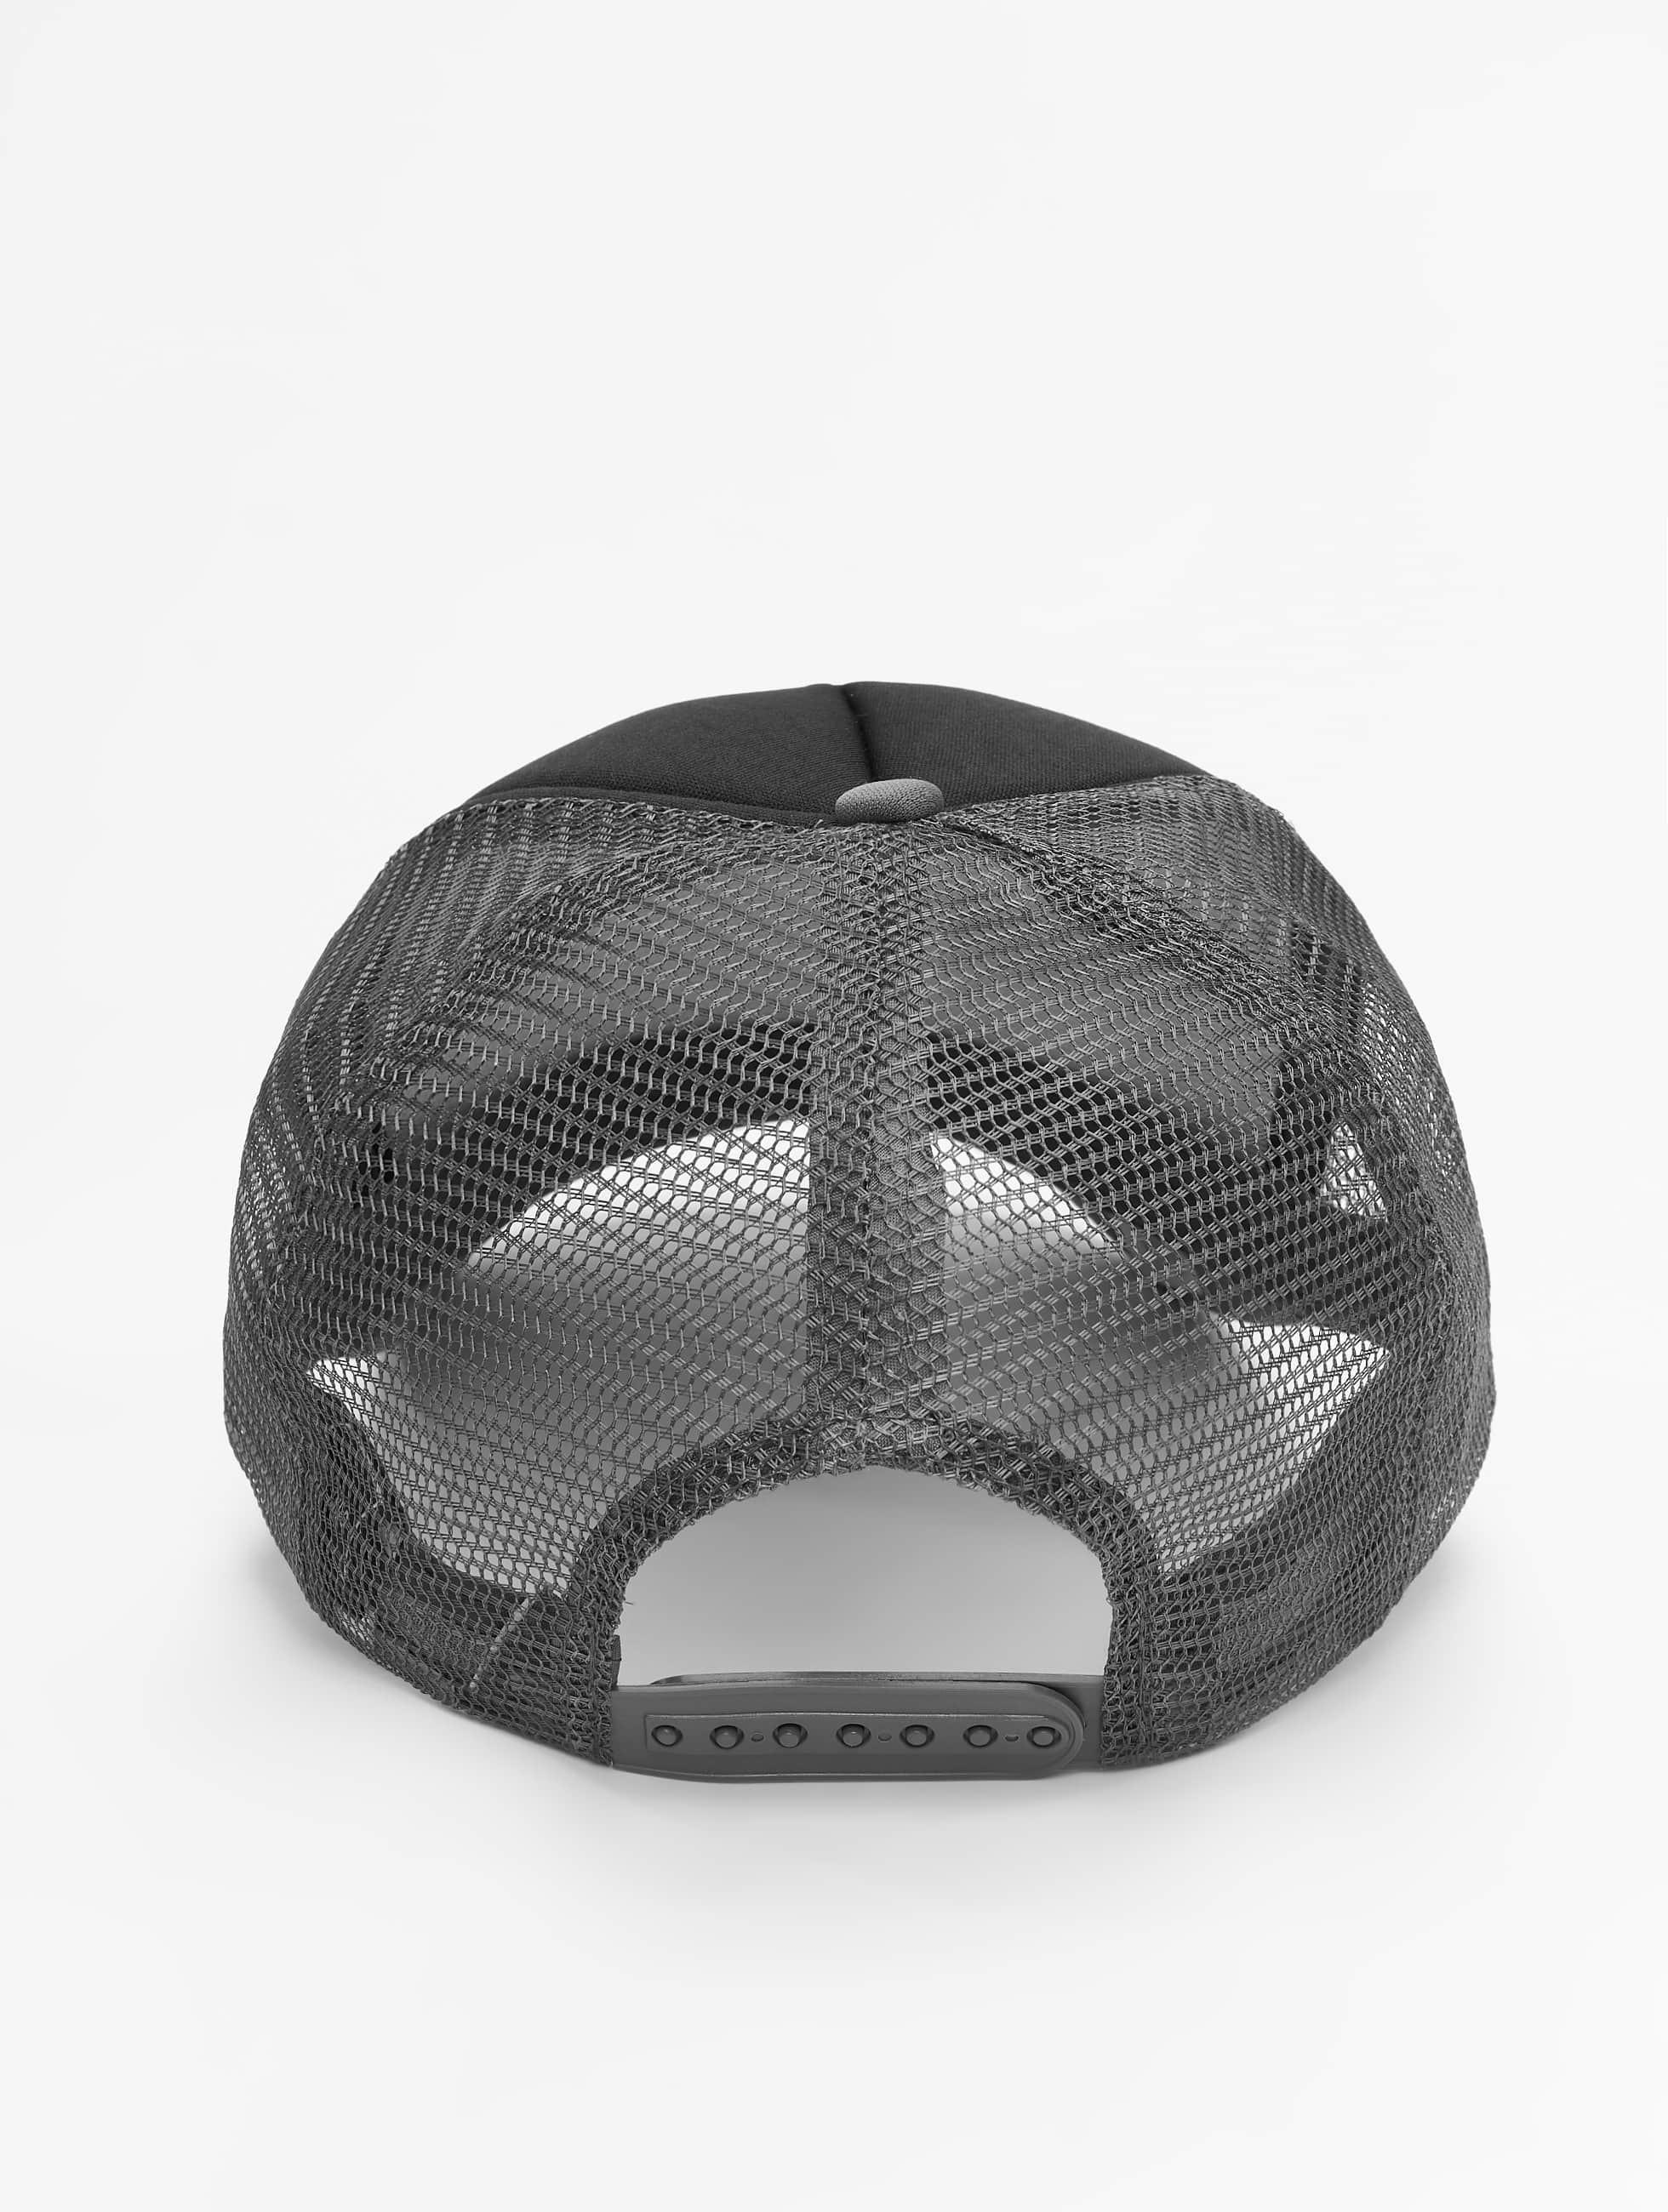 MSTRDS Casquette Trucker mesh High Profile Baseball gris